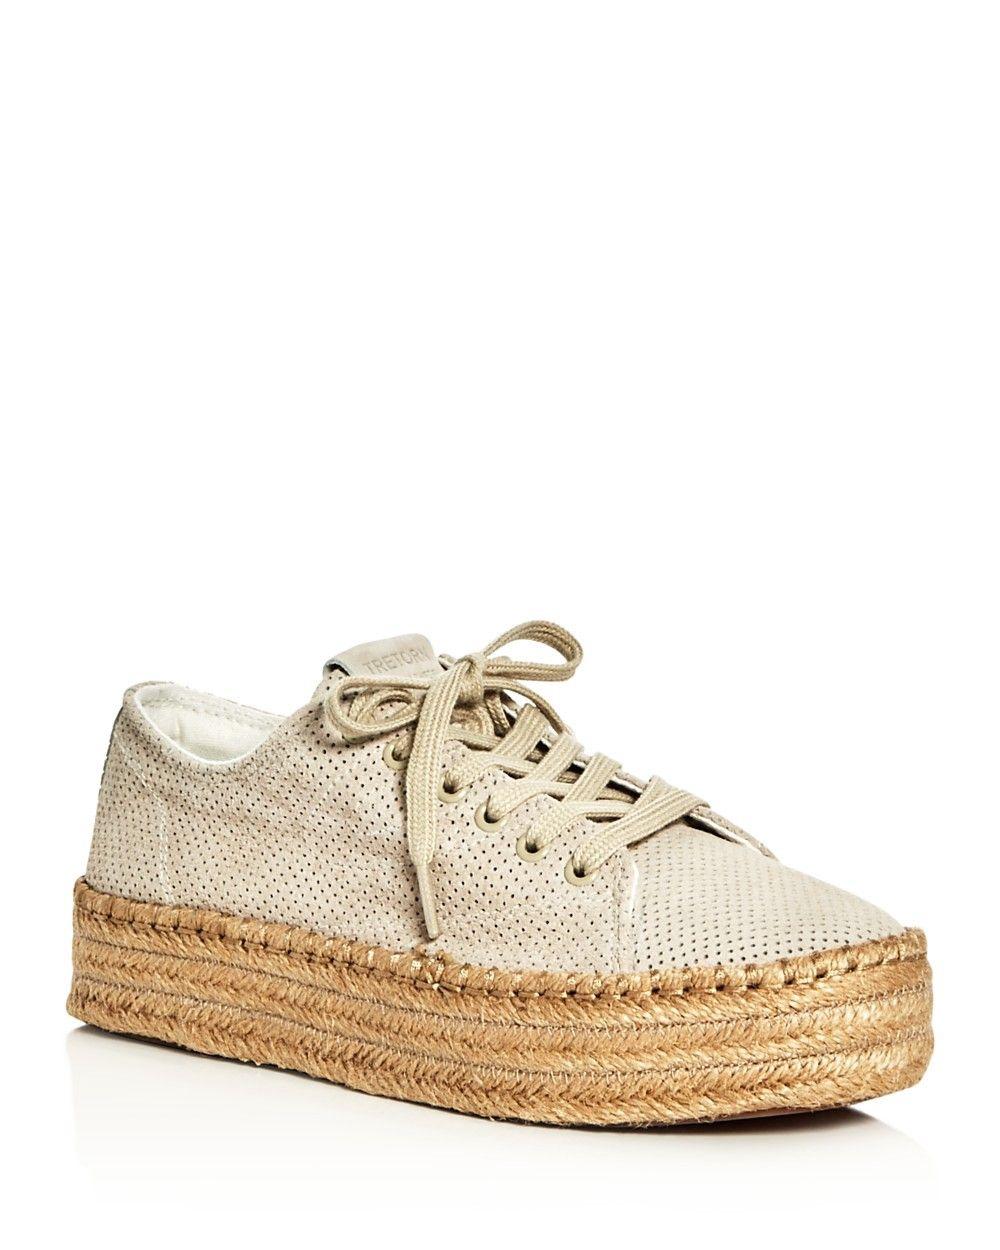 c7923572919 TRETORN Tretorn Women s Eve Lace Up Platform Espadrille Sneakers.  tretorn   shoes  all